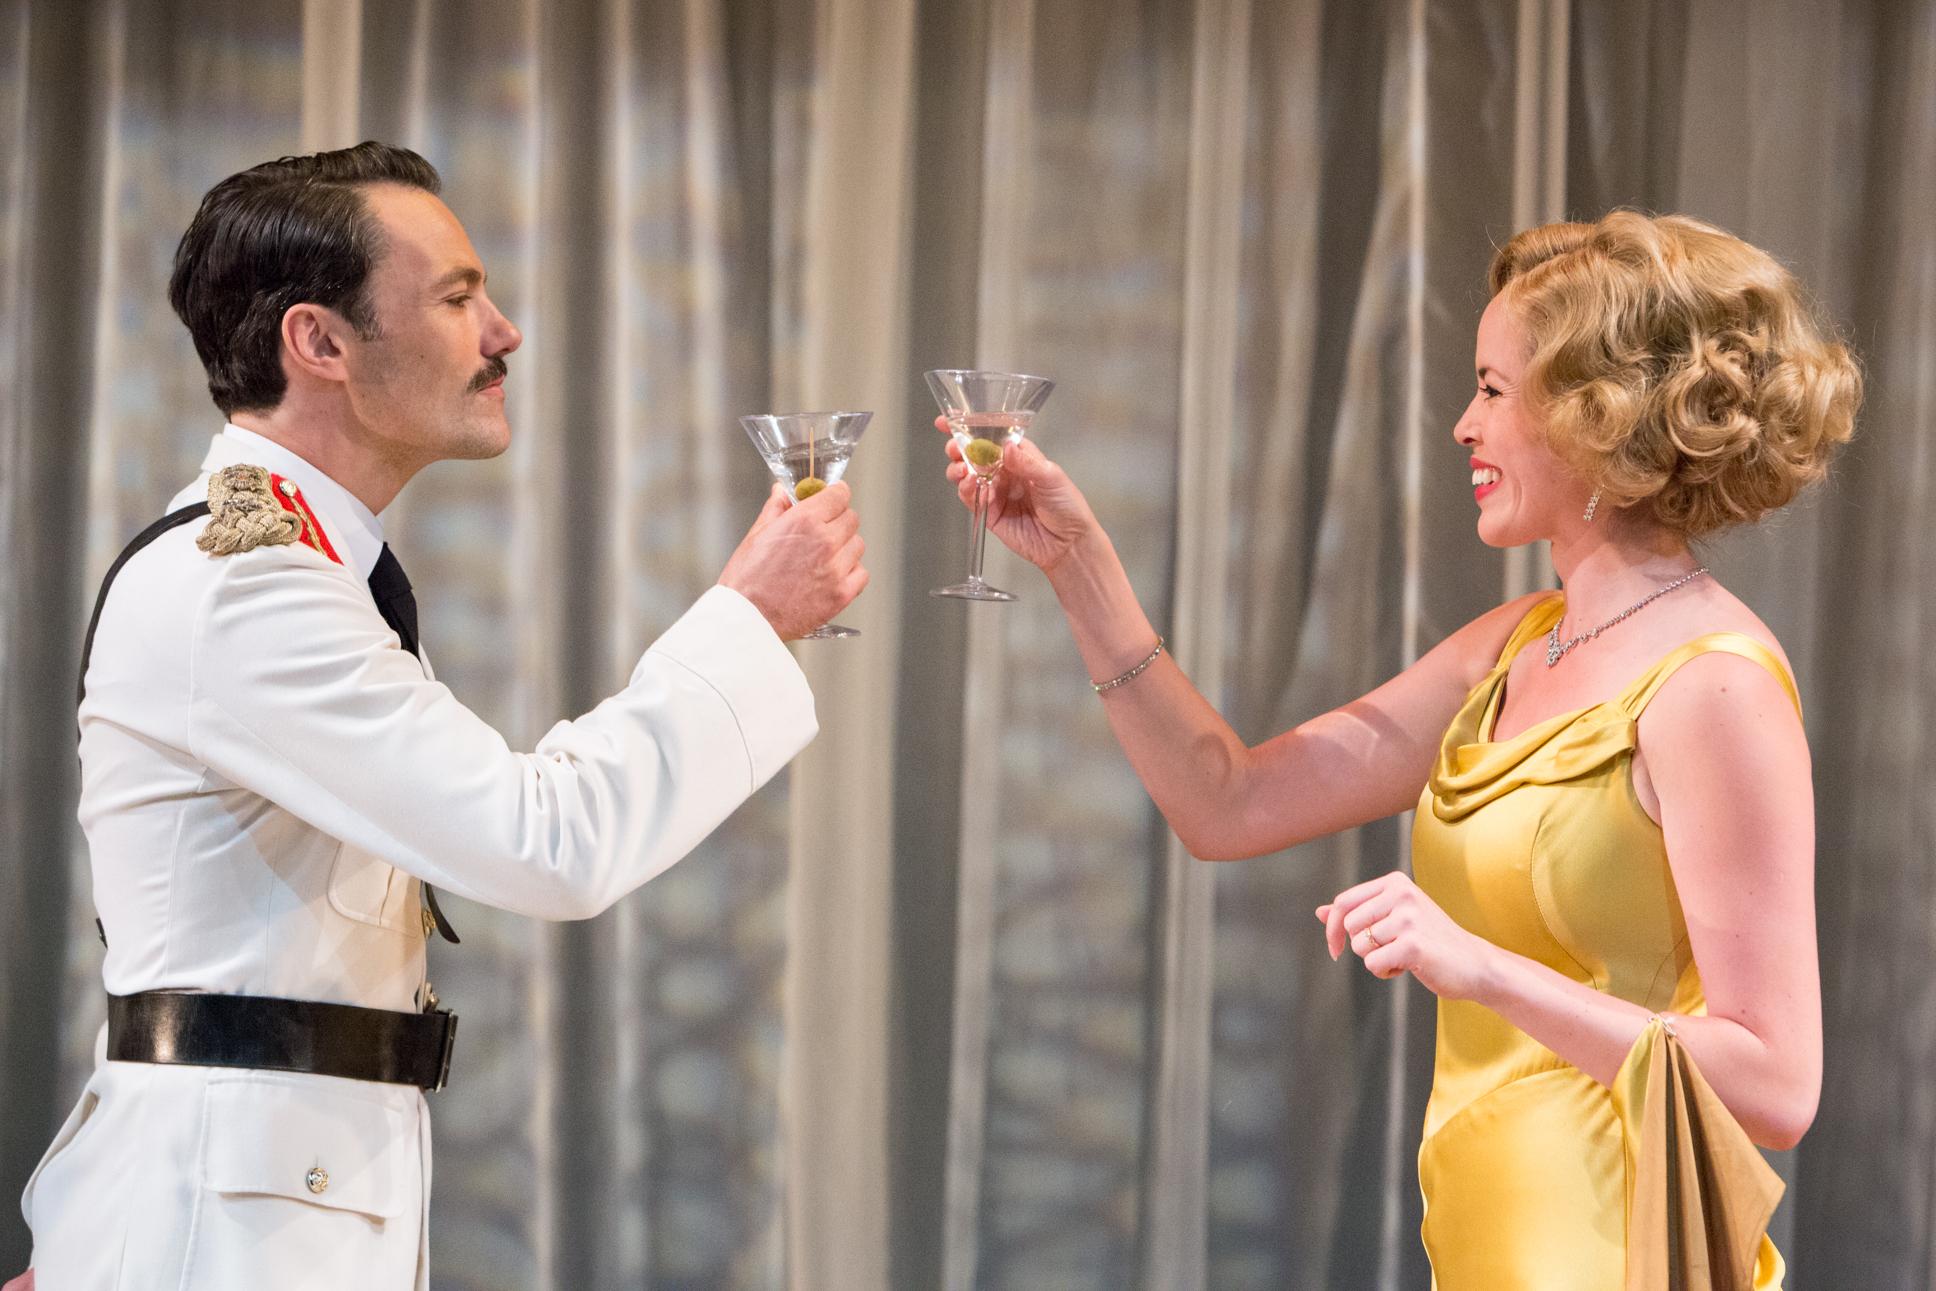 Matt Rawle as Duke Theseus, Fiona Hamption as Hippolyta. A Midsummer Night's Dream at the New Wolsey Theatre. Dir Trevor Nunn. Photo Mike Kwansiak.jpg